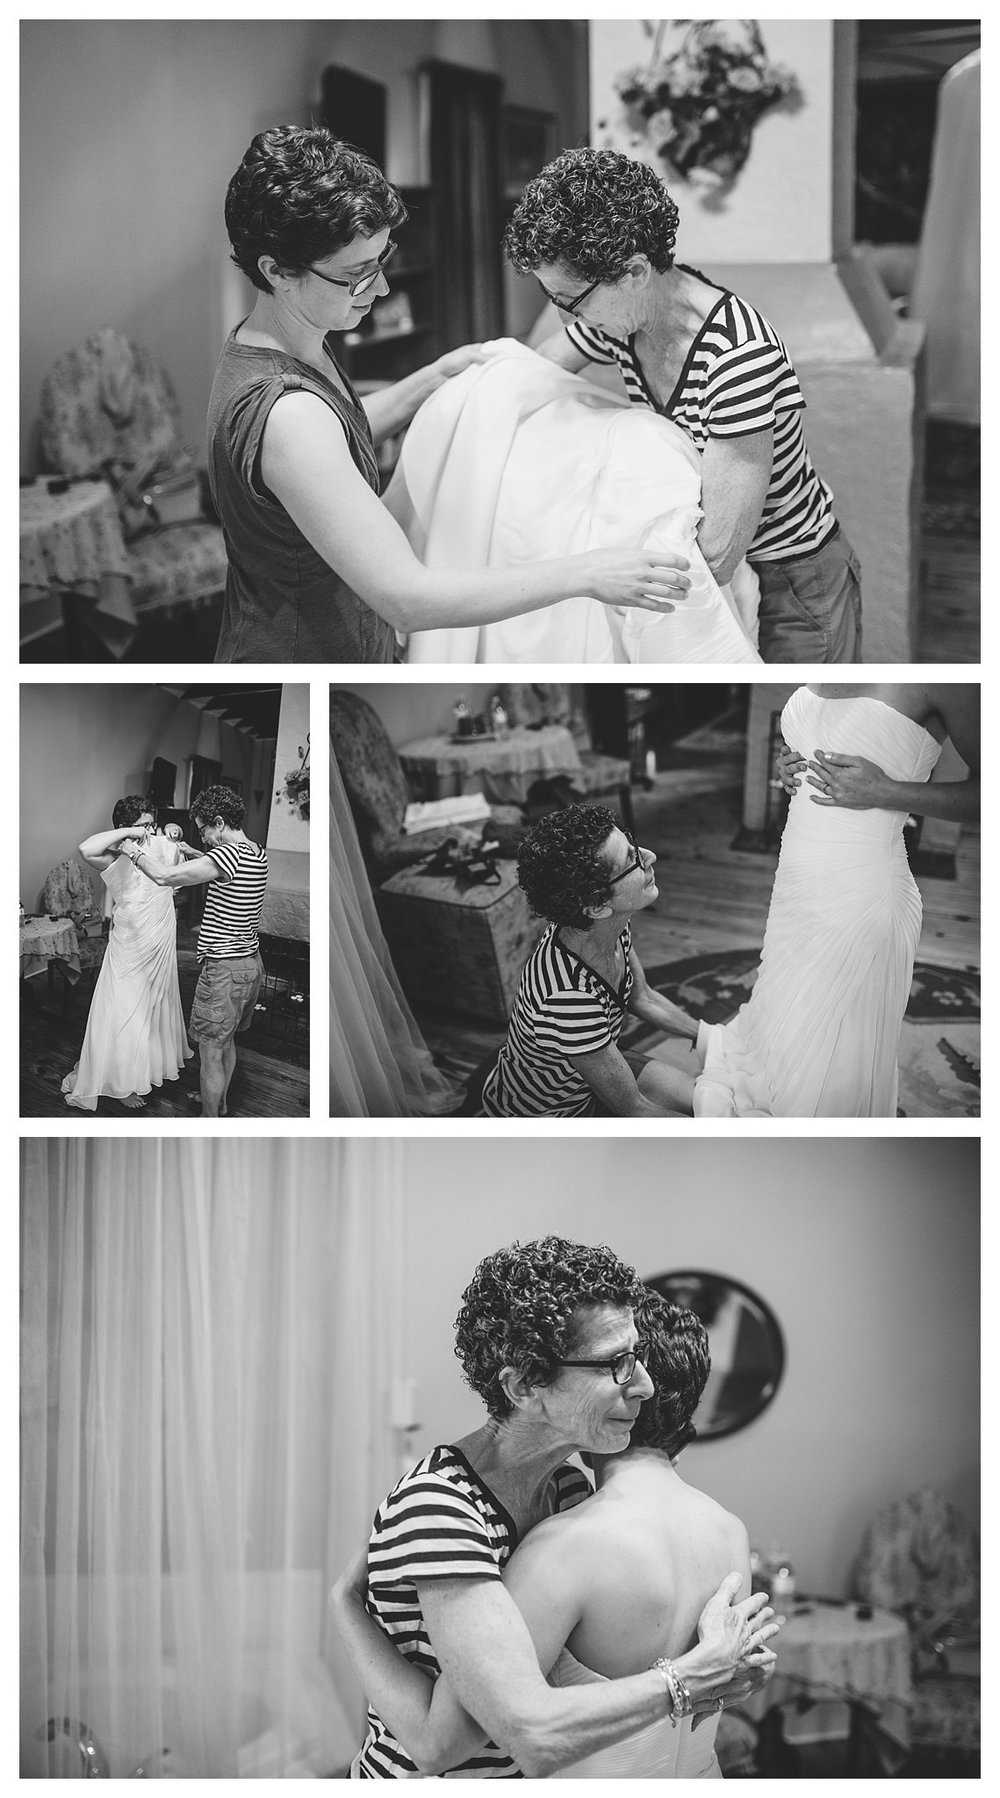 everleigh-photography-cincinnati-wedding-photographer-cincinnati-wedding-photography-sweetwater-branch-inn-gainesville-florida-wedding-60